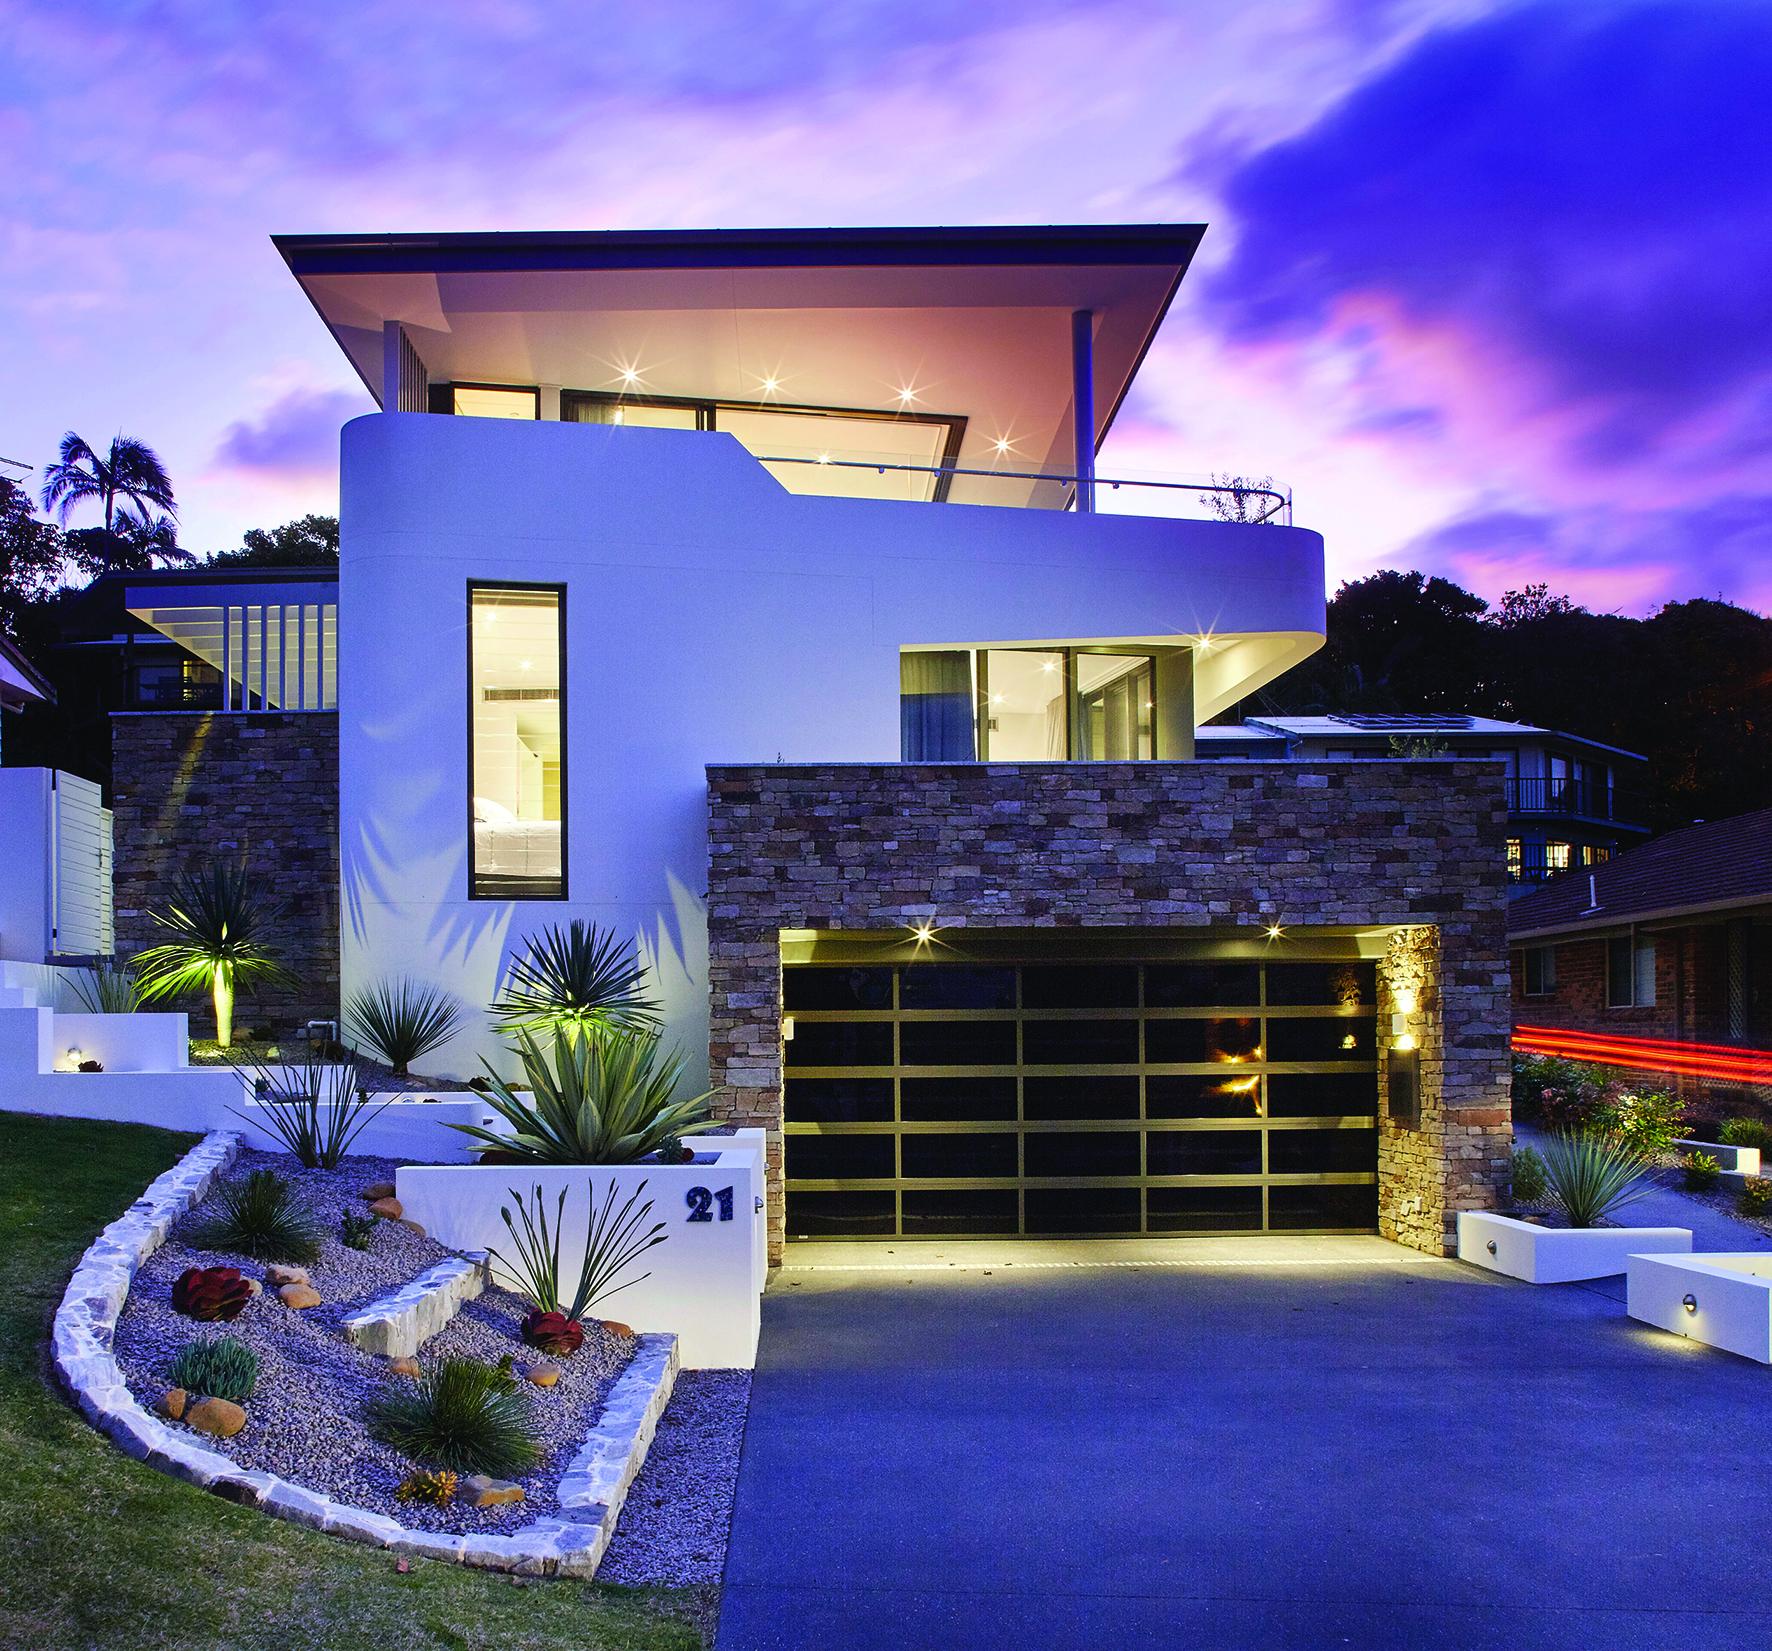 Wavefront Townhouses, Lennox Head, NSW, Australia